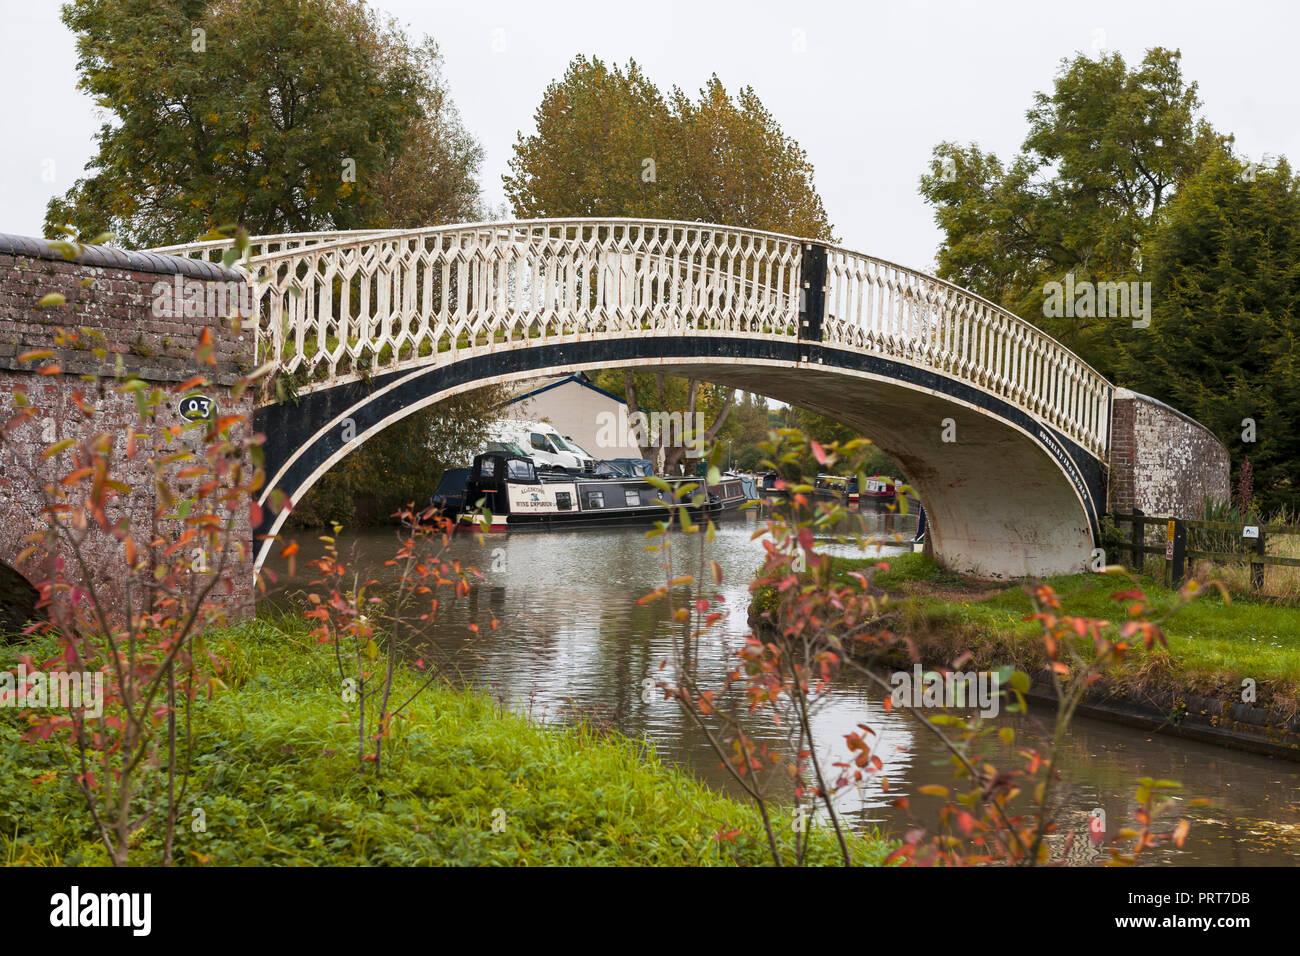 One of the bridges at Braunston Turn, Braunston, Northamptonshire, England, UK - Stock Image